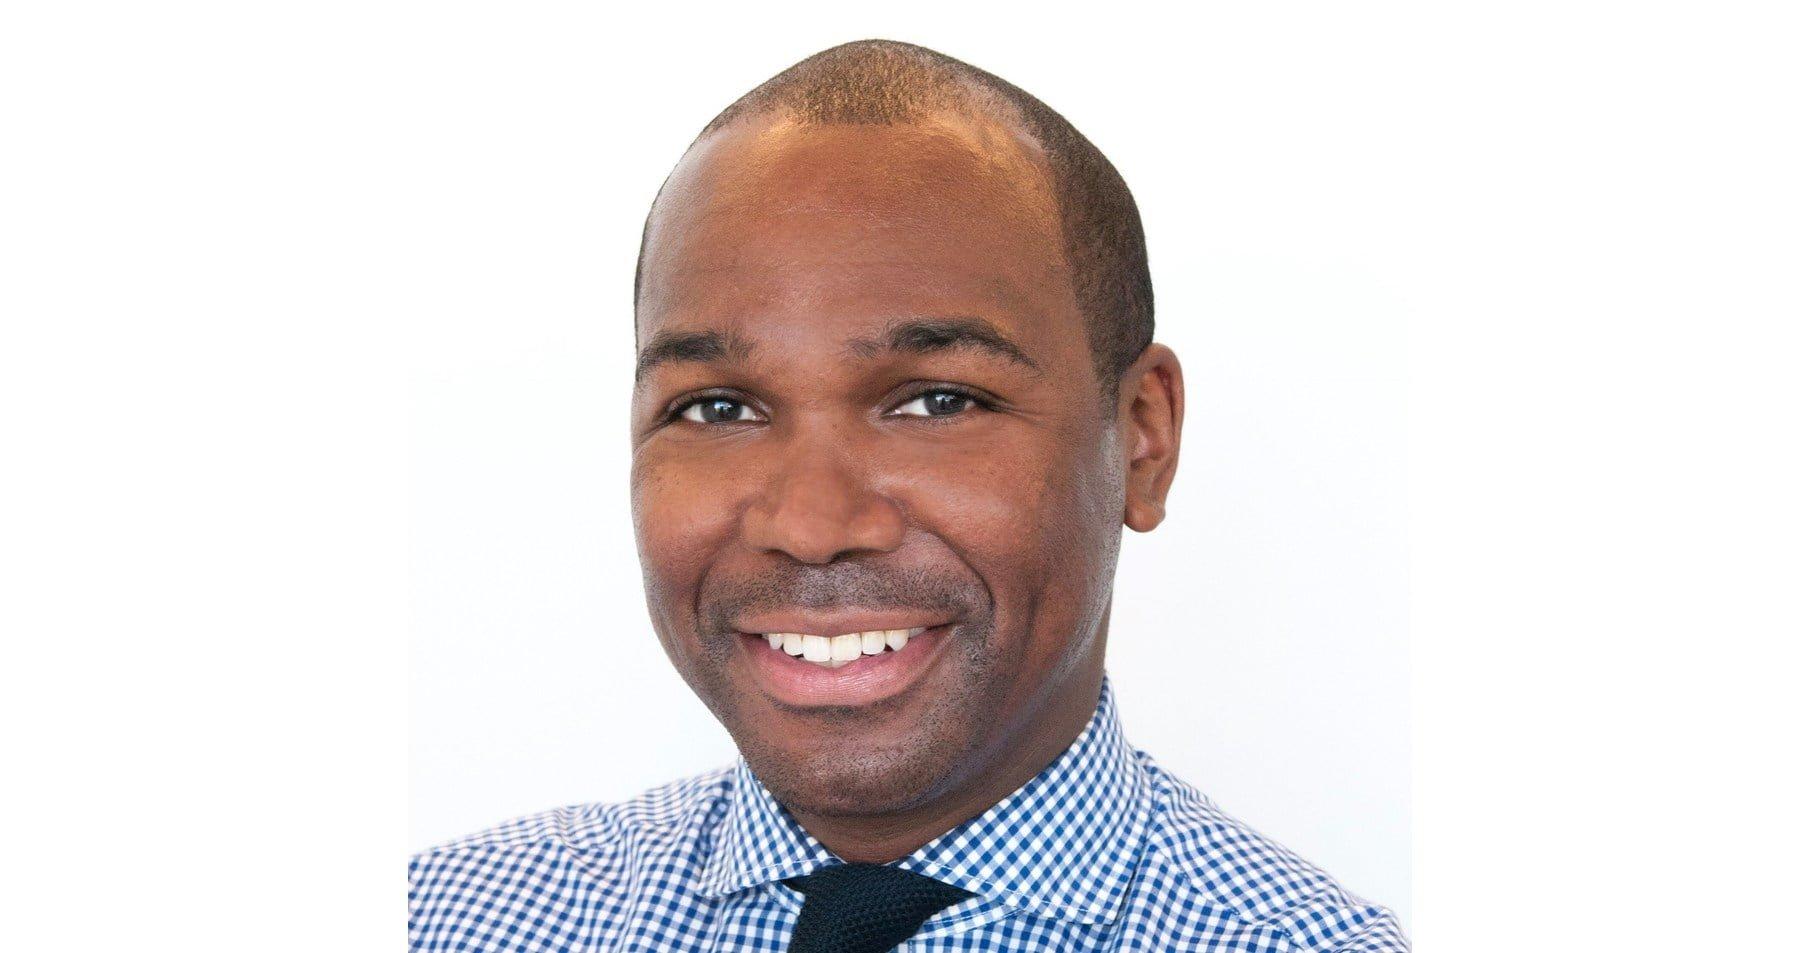 Darnell Strom Joins Wynn Resorts Board Of Directors